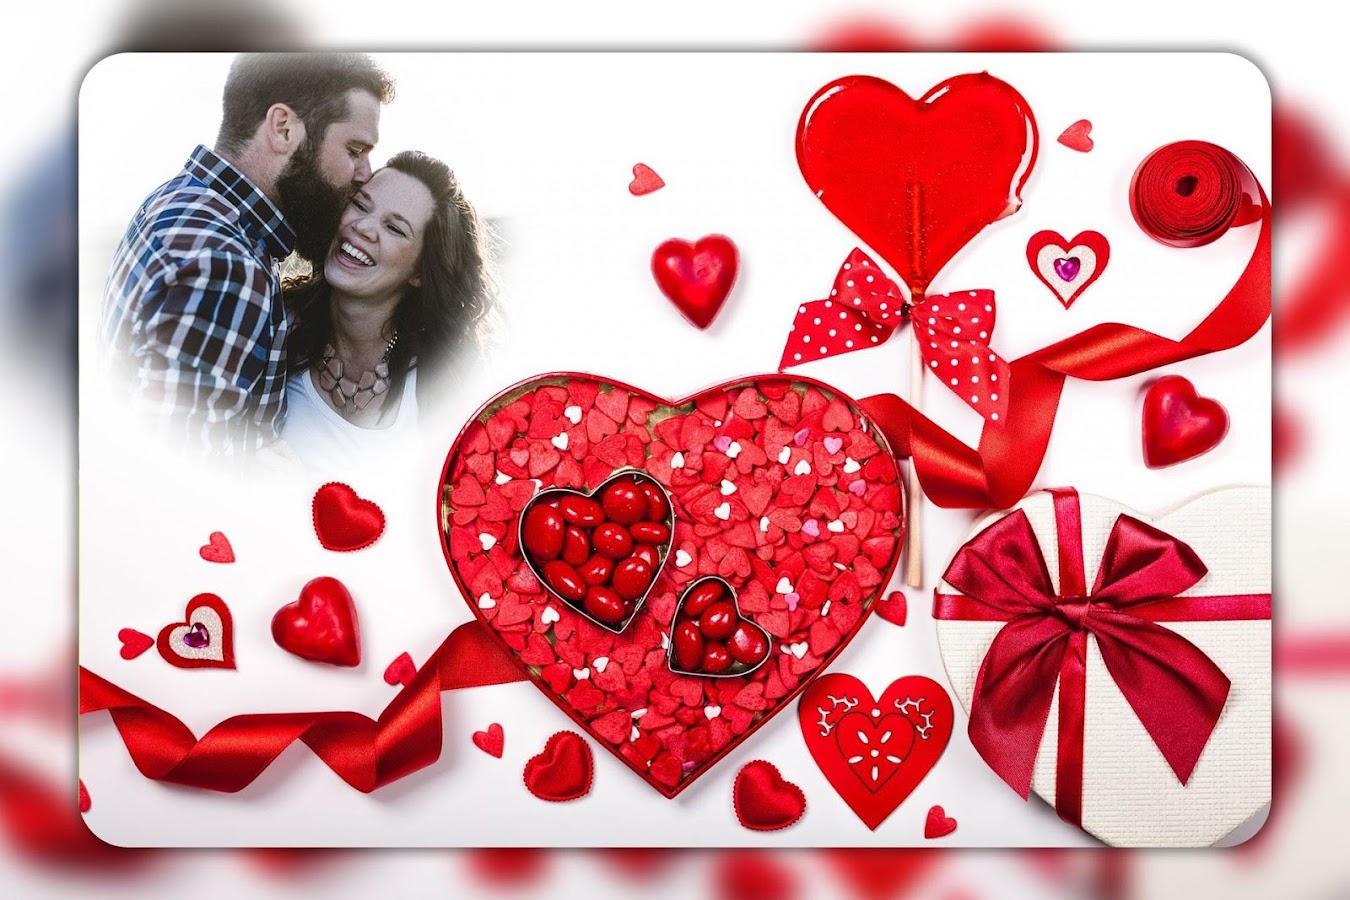 Romantic love photo frames love editor android apps on google play romantic love photo frames love editor screenshot jeuxipadfo Gallery